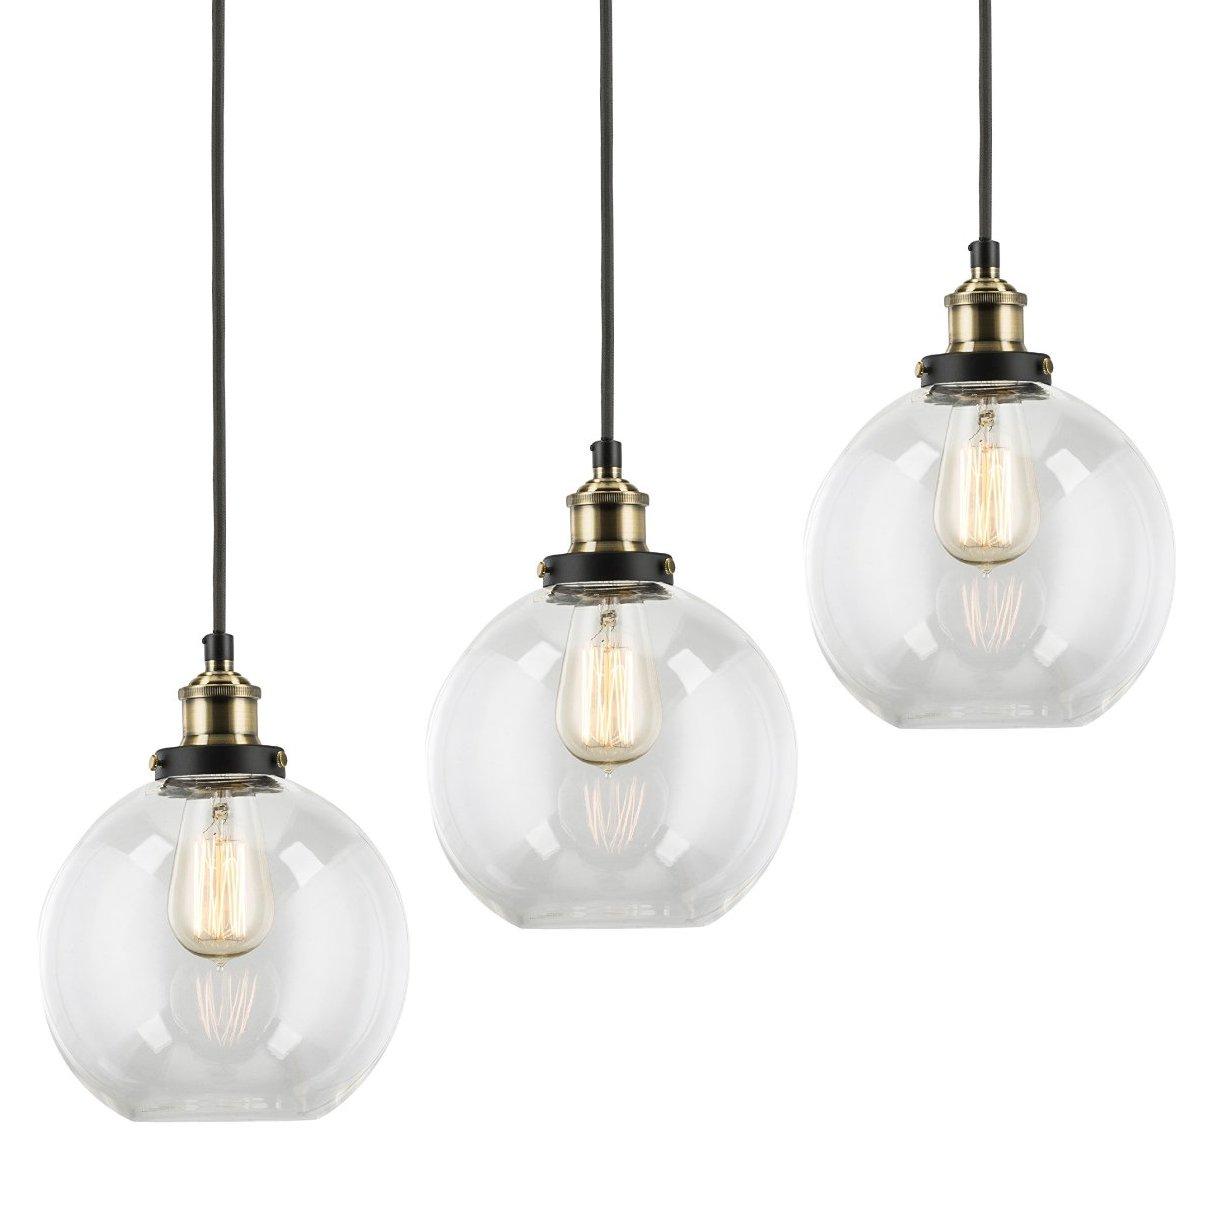 3 pack modern industrial vintage glass globe pendant light mklot minimalist eco power edison style 7 87 wide hanging chandelier ceiling lighting mounted